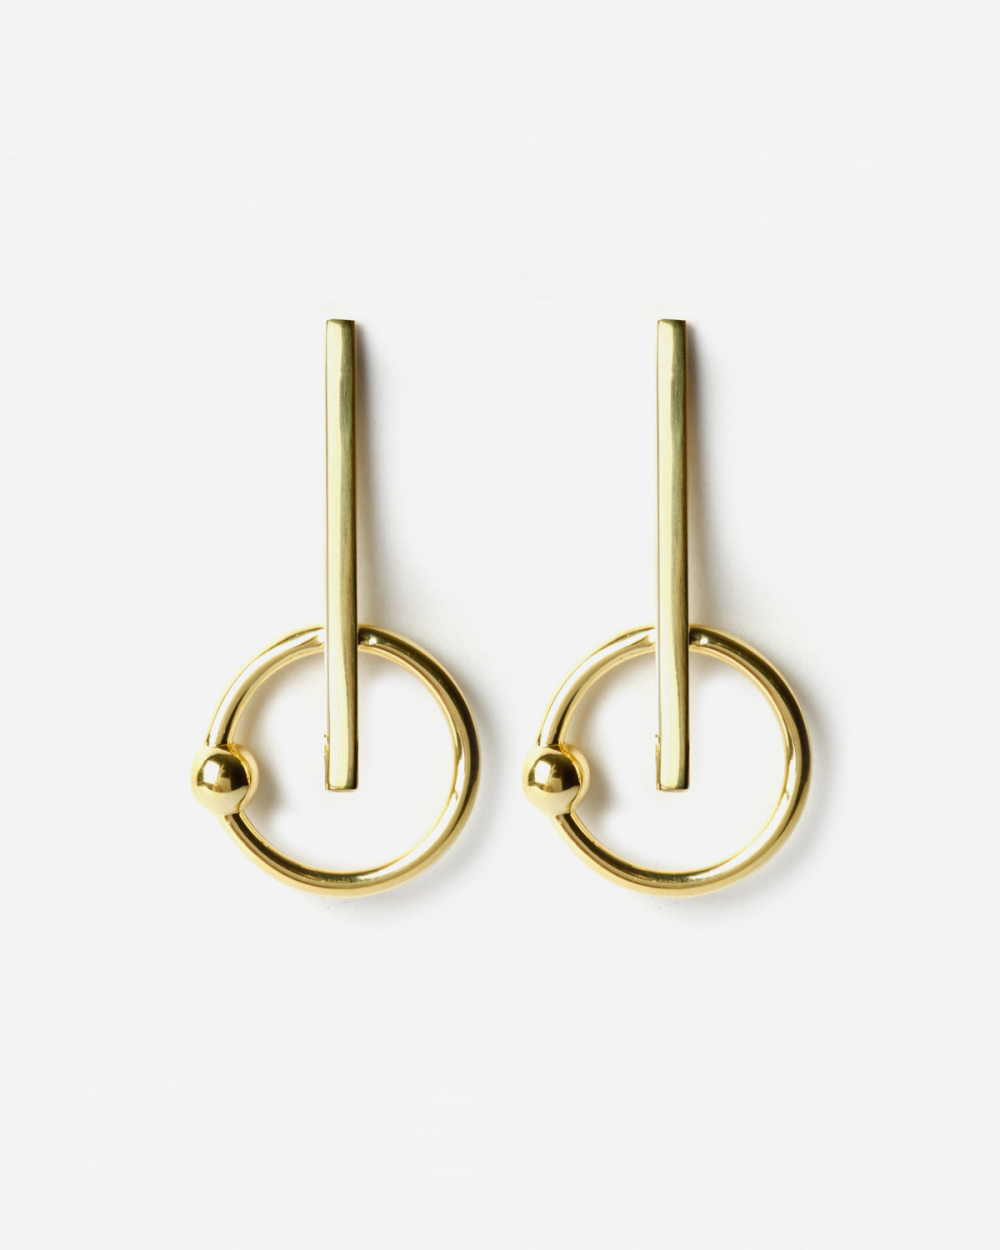 Earrings YELLOW GOLD MATRIX EARRINGS NOVE25